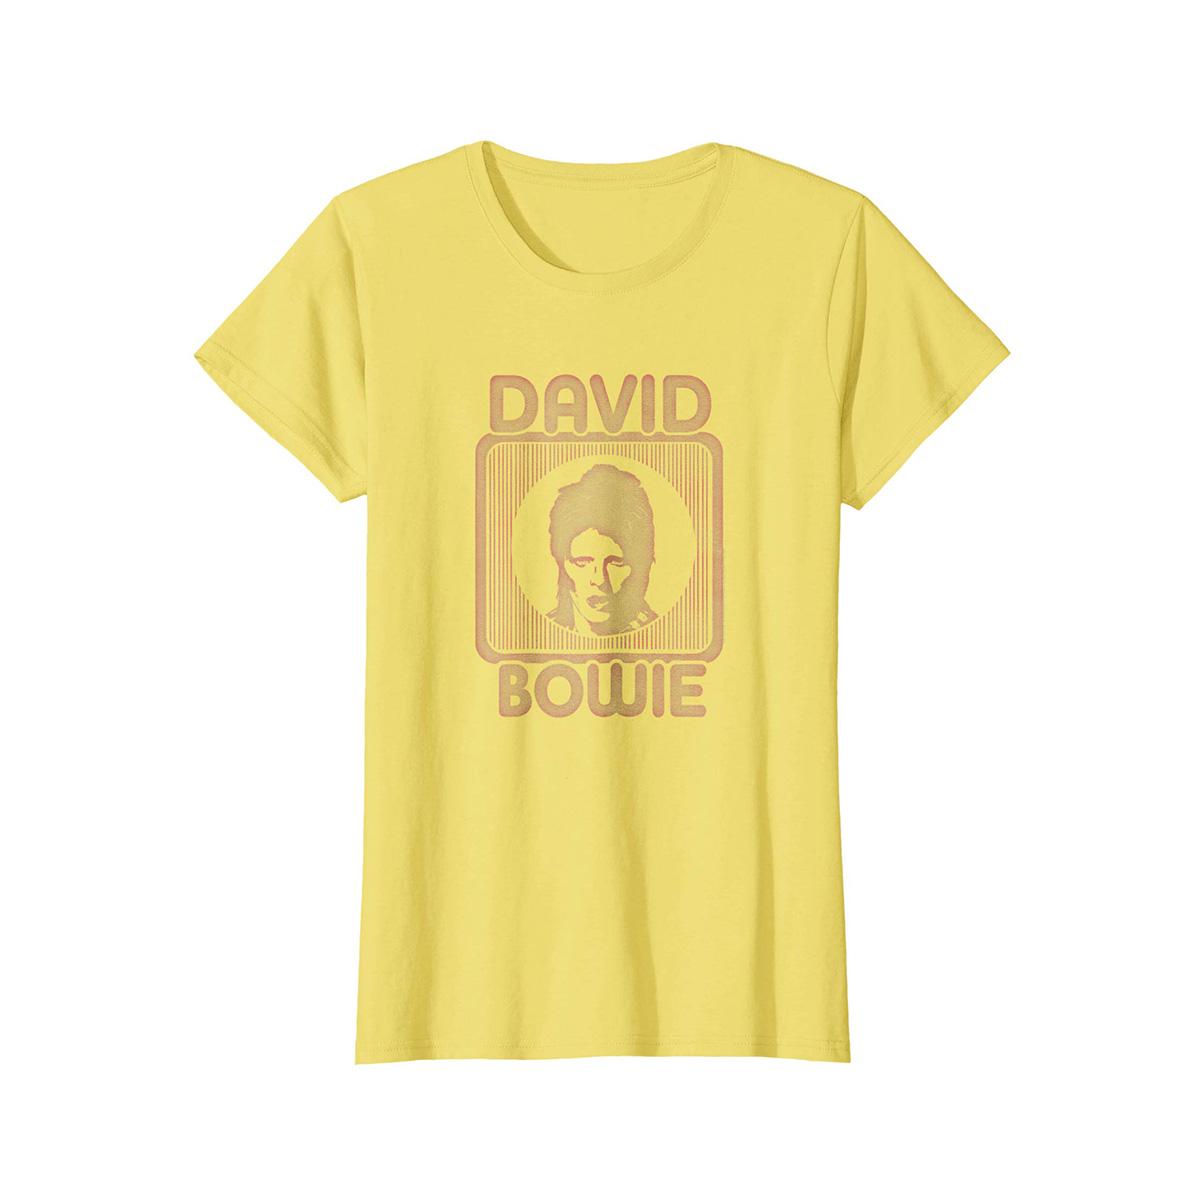 Women's Changes T-Shirt